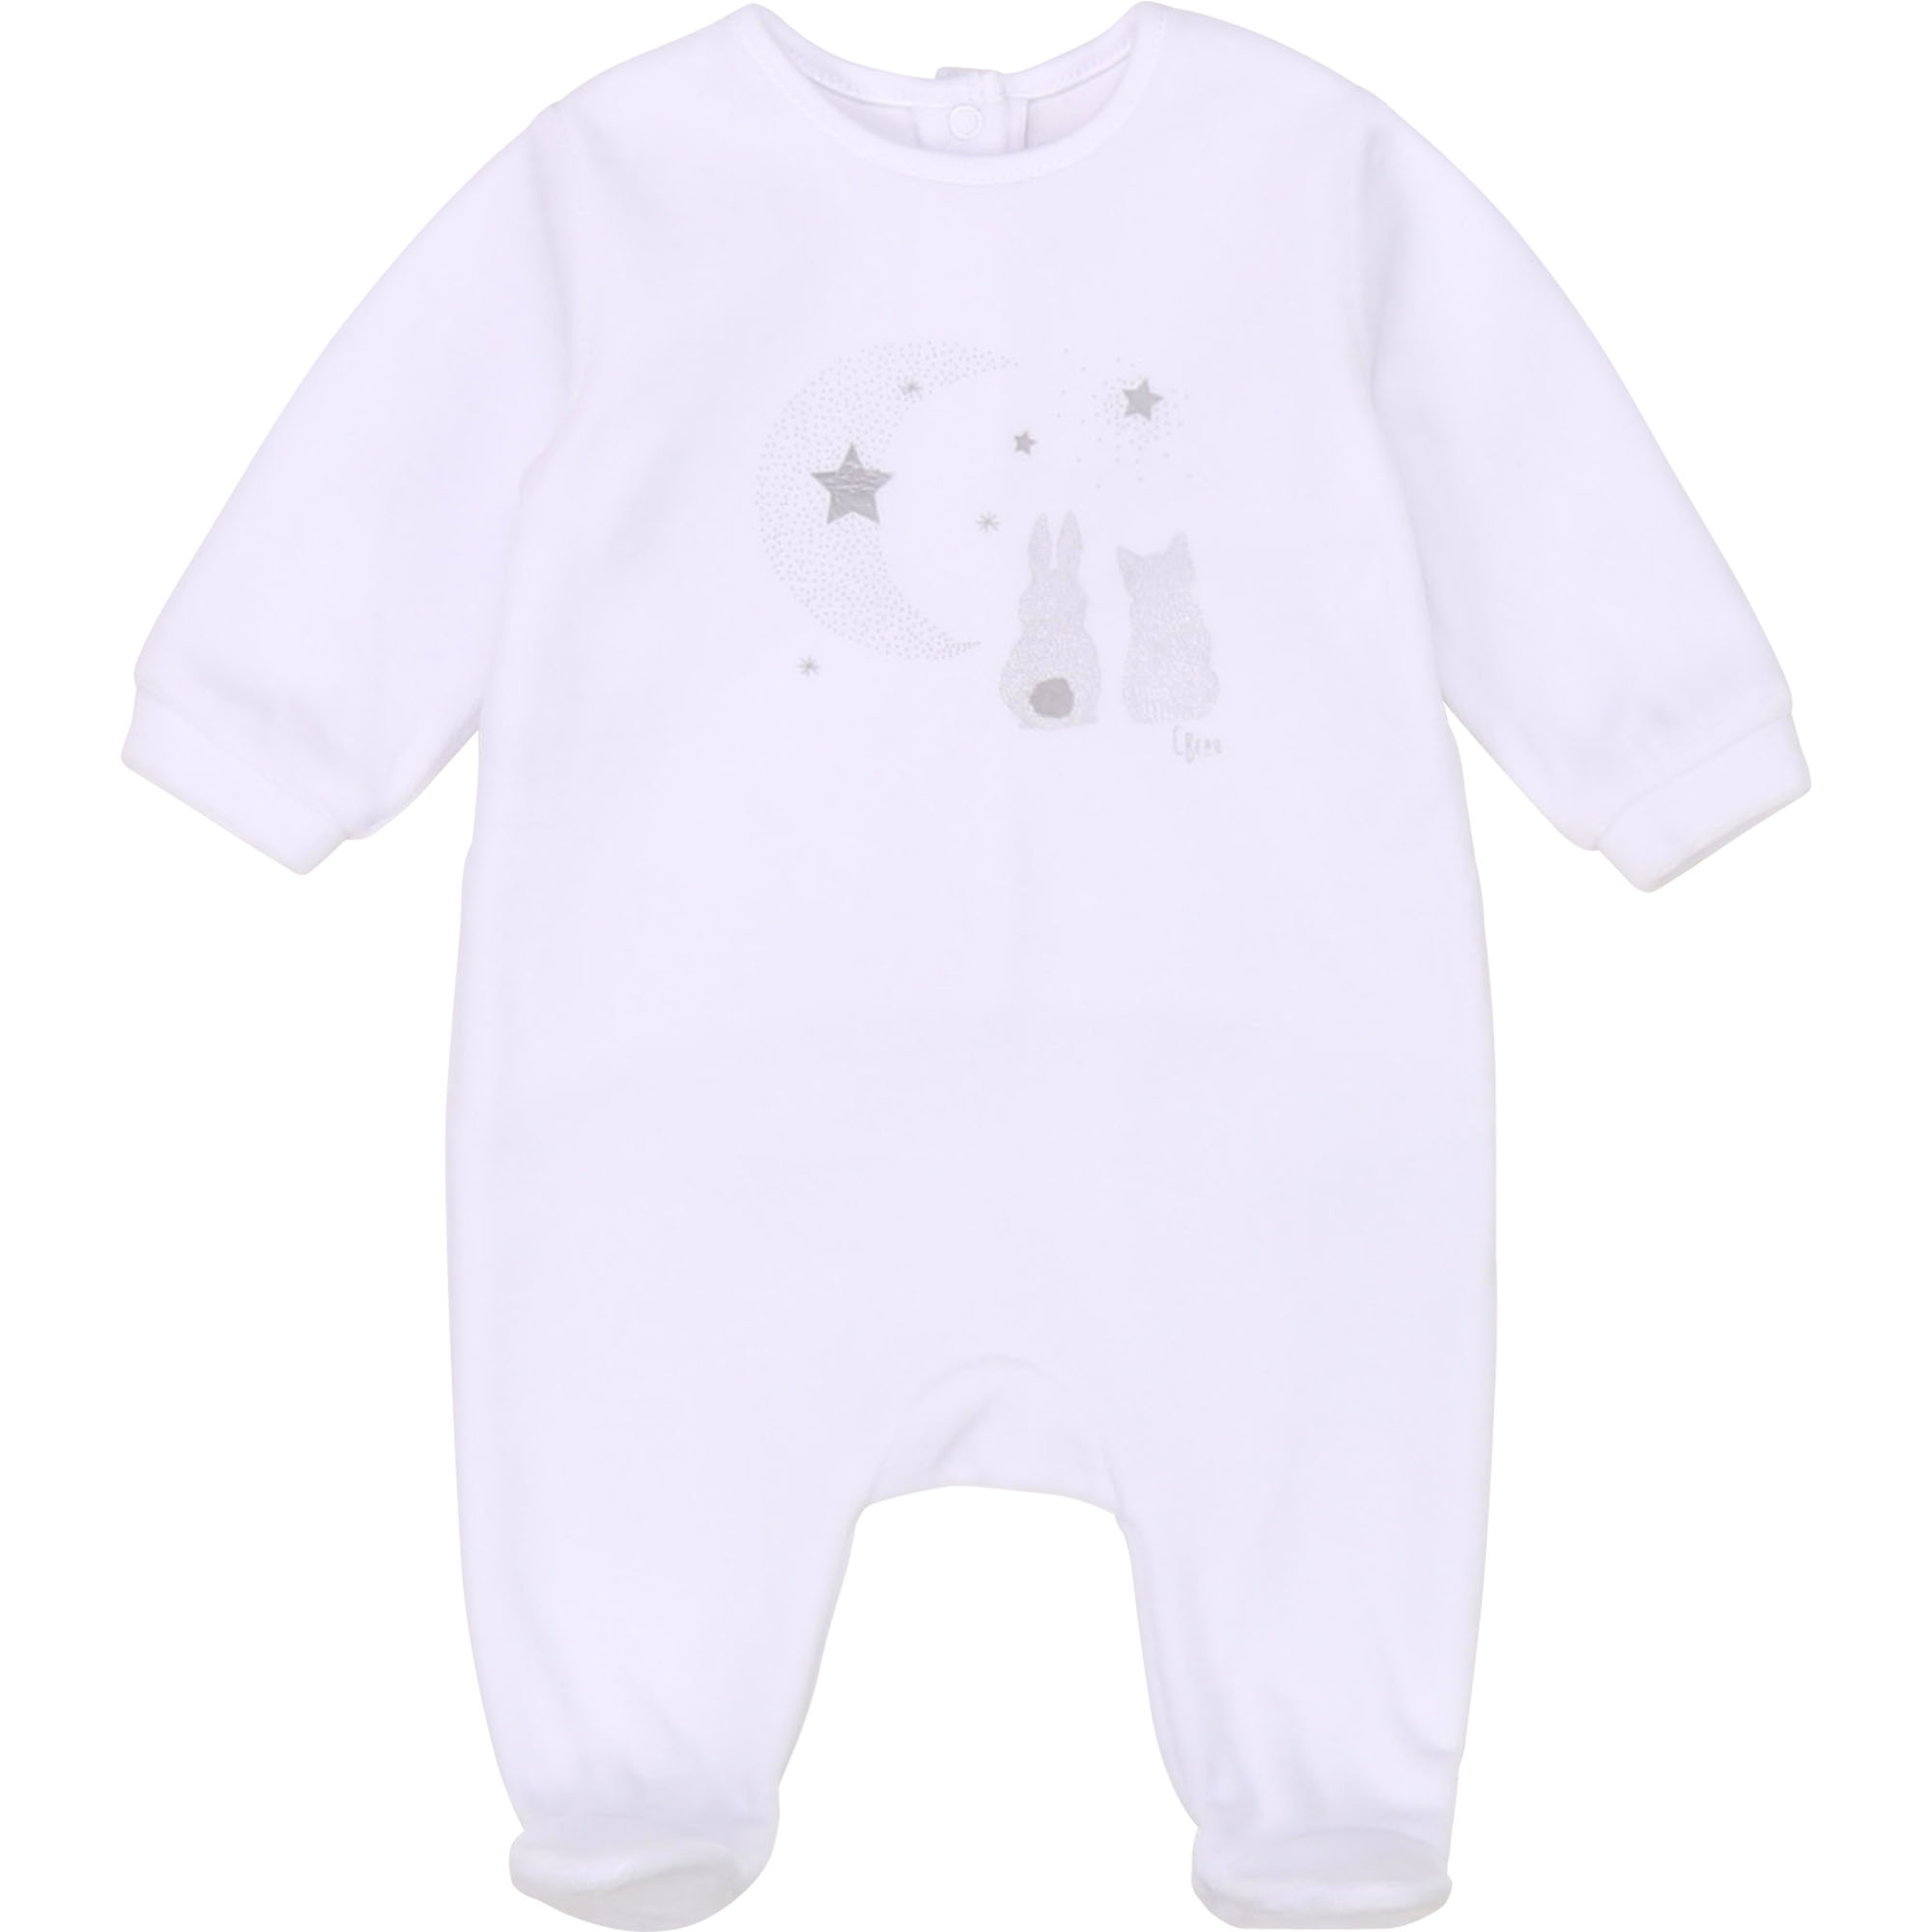 Pyjama coton bio majoritaire CARREMENT BEAU BEBE COUCHE GARCON Blanc